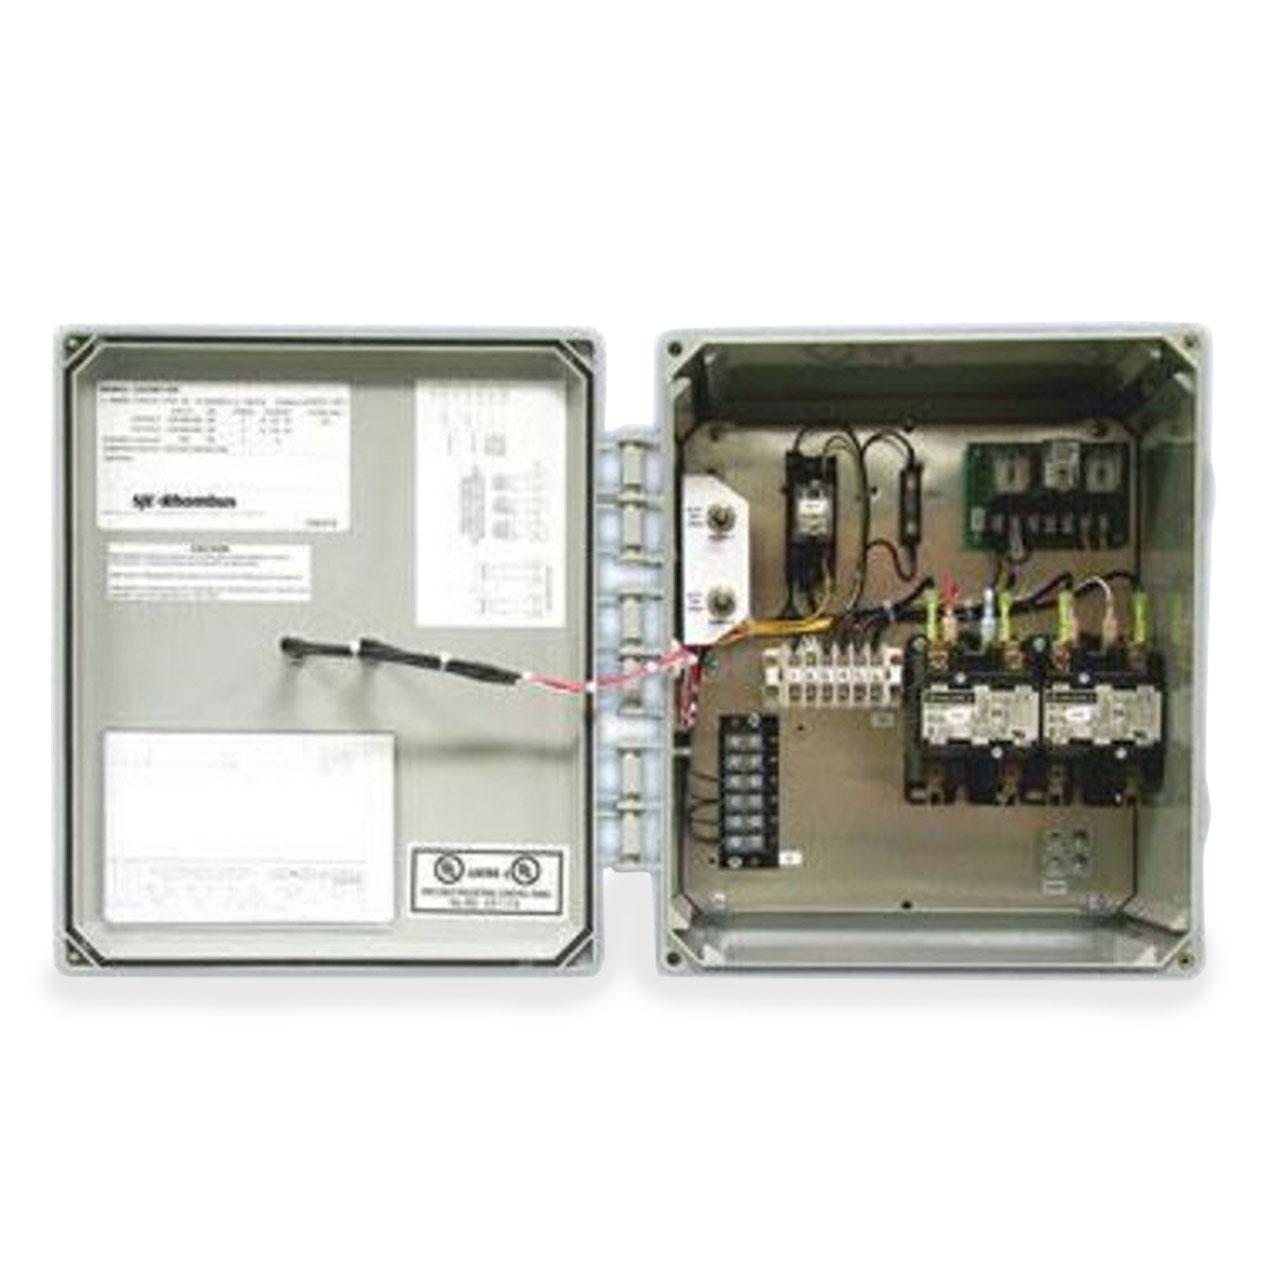 Sje Rhombus Model 126 Duplex Alternating Single Phase Little Giant Grinder Pump Wiring Diagram Water Well Control Cp Sje126